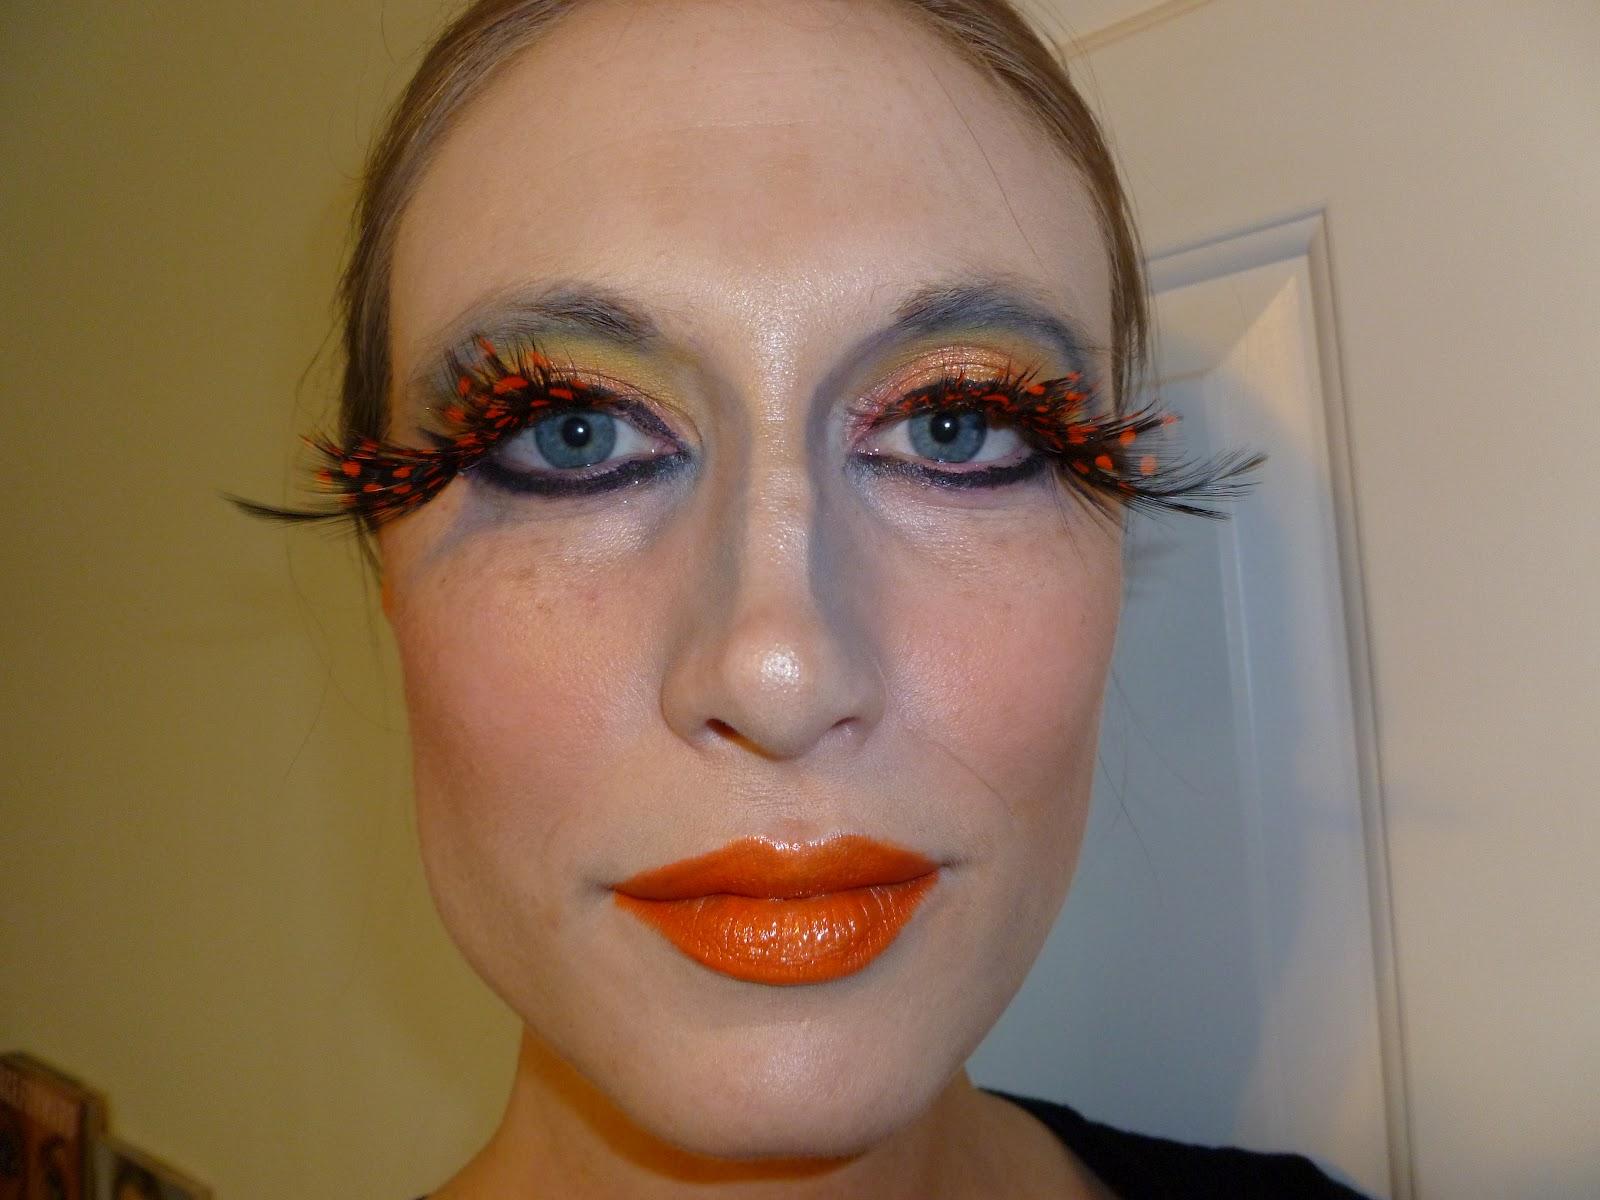 Makeup Matters: Avant Garde- High Fashion Makeup